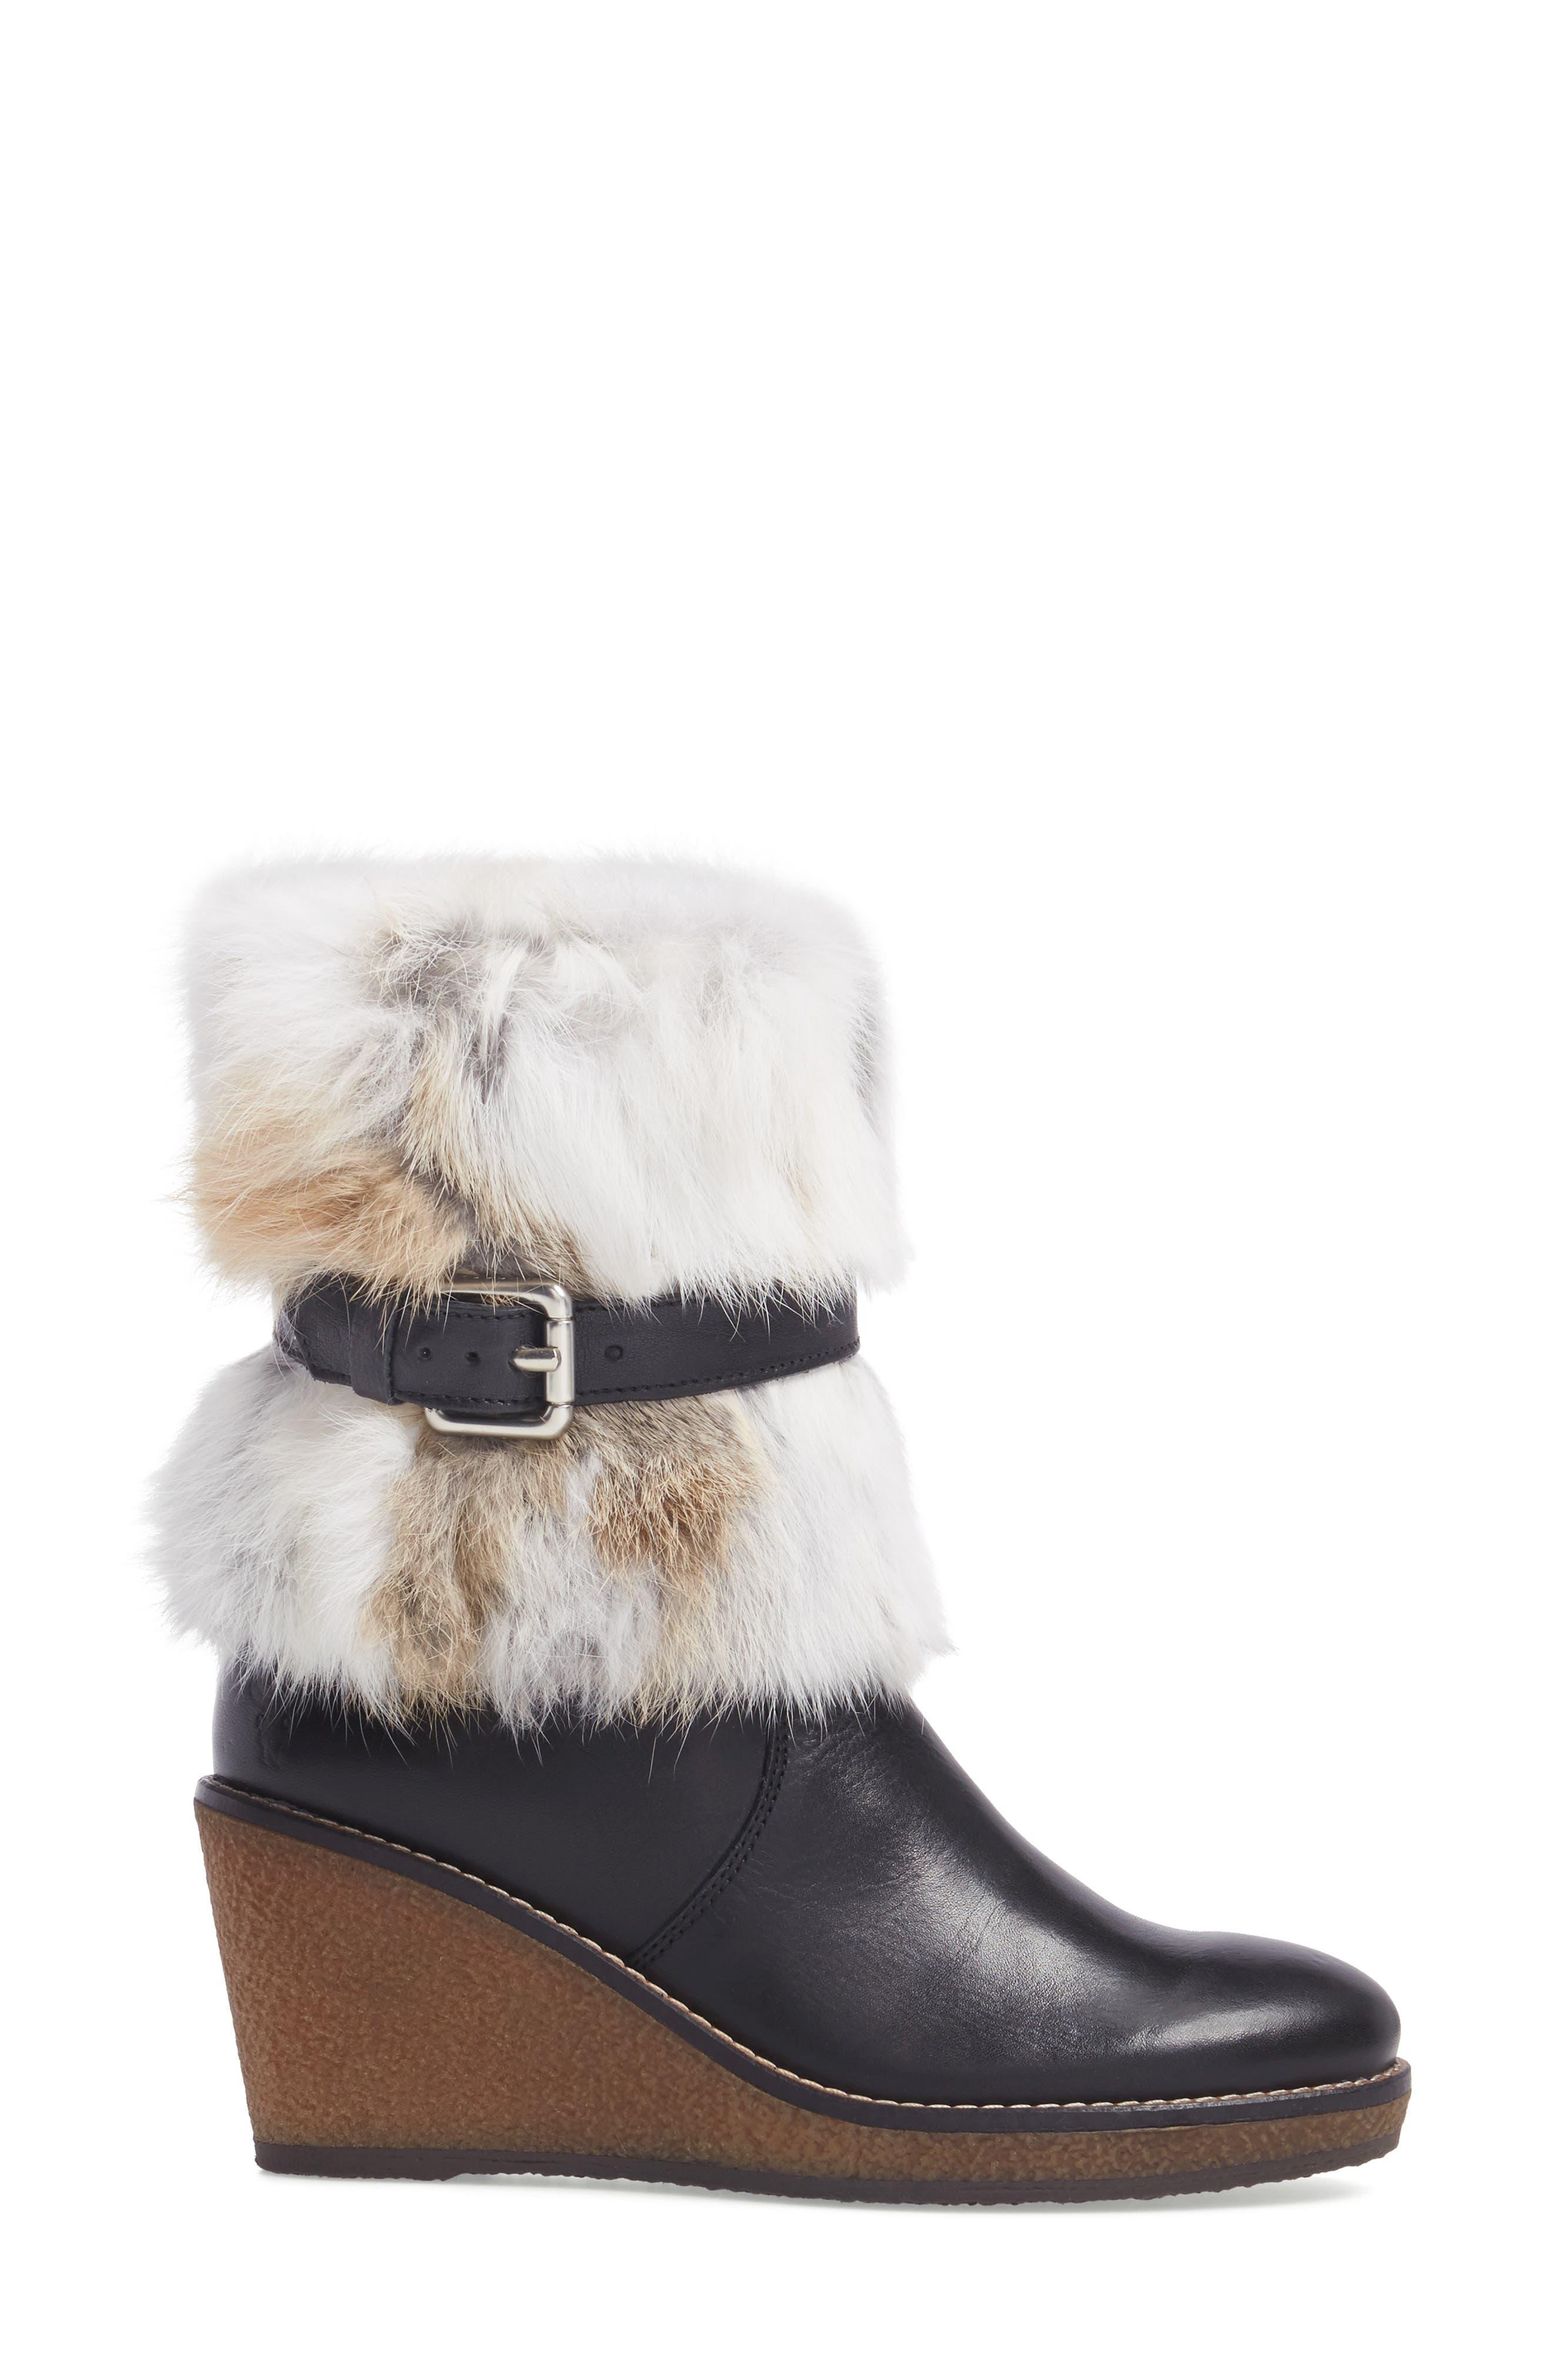 Tasarla Genuine Rabbit Fur Trim Boot,                             Alternate thumbnail 3, color,                             001